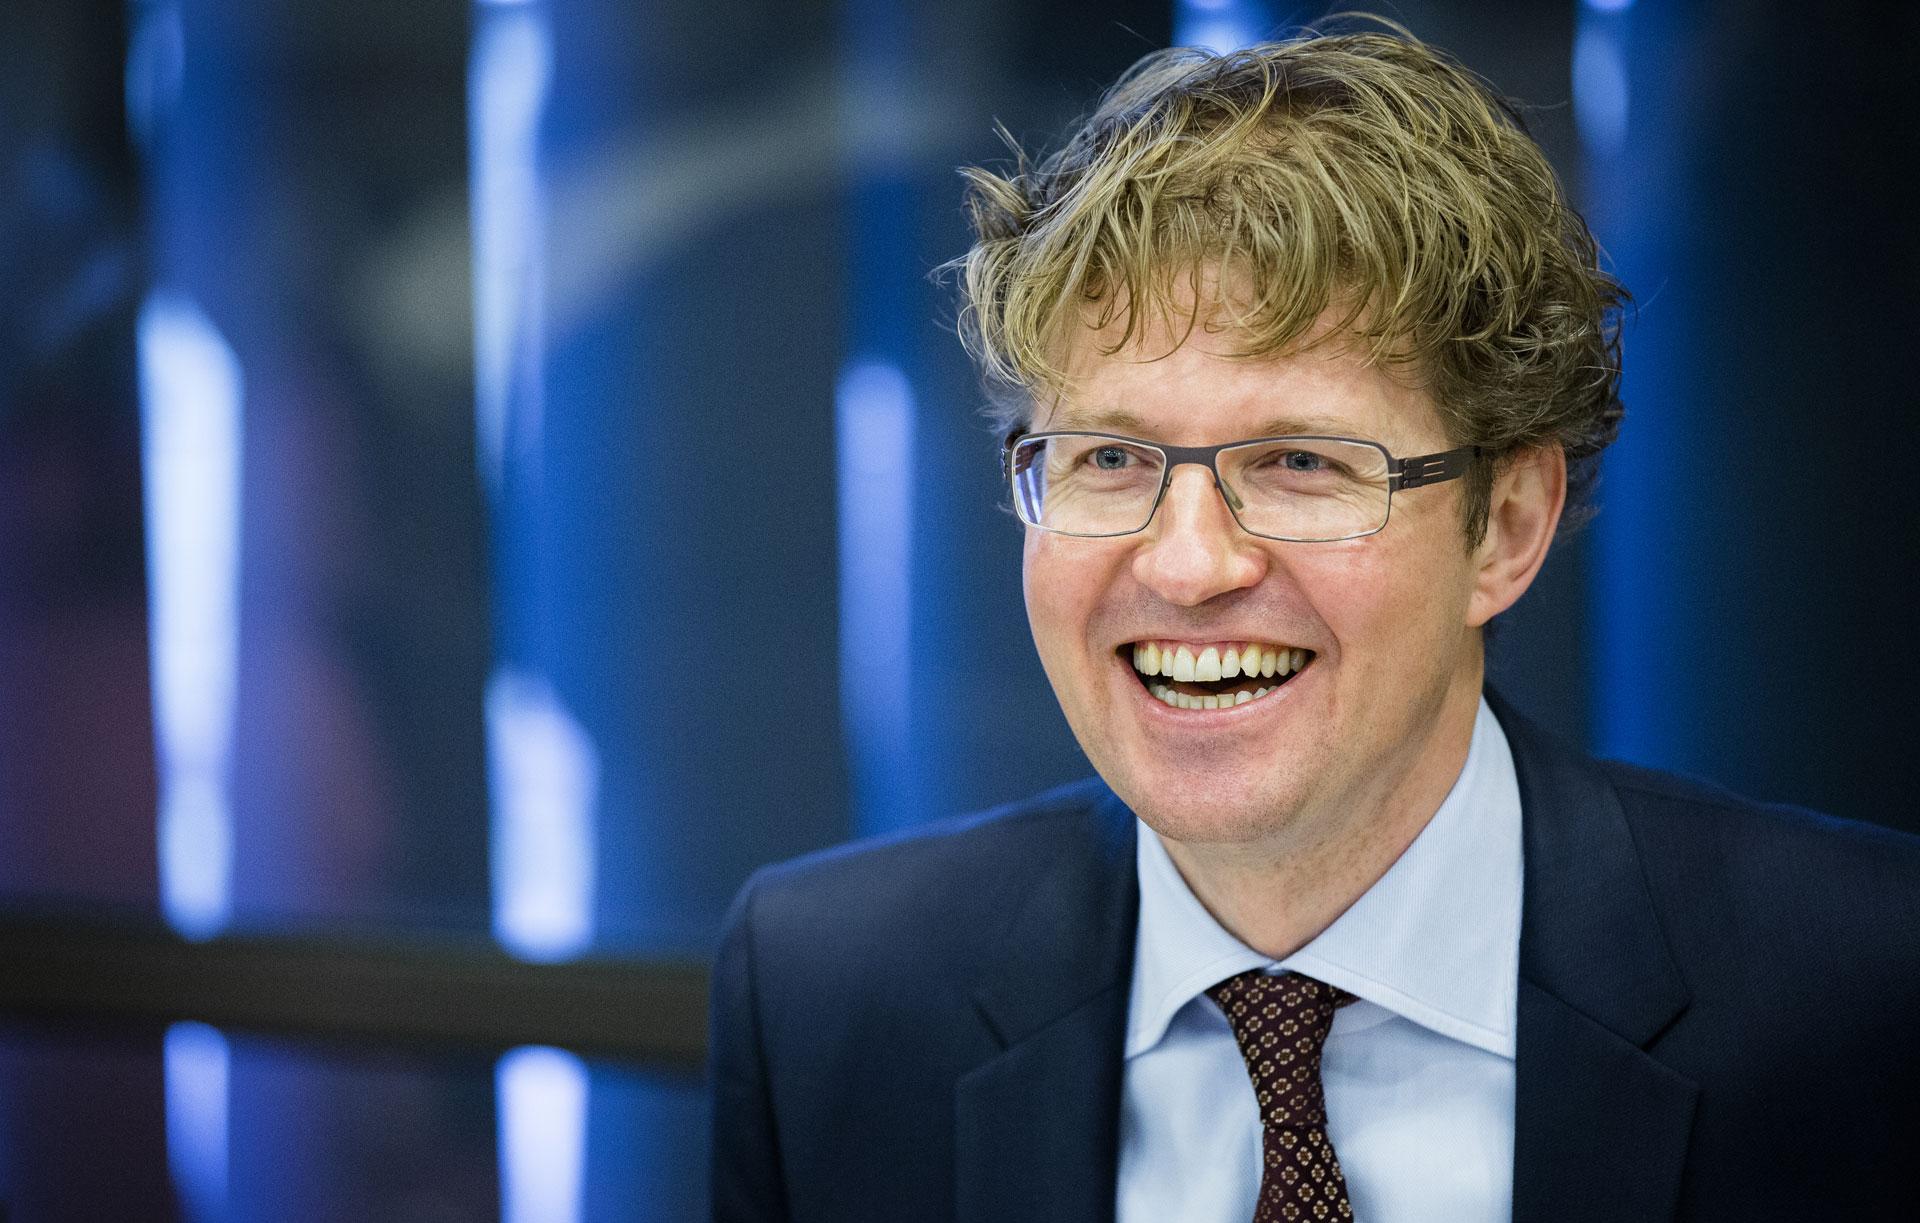 Provincie friesland trekt knip voor omrop fryslan - Kamer vreest ...